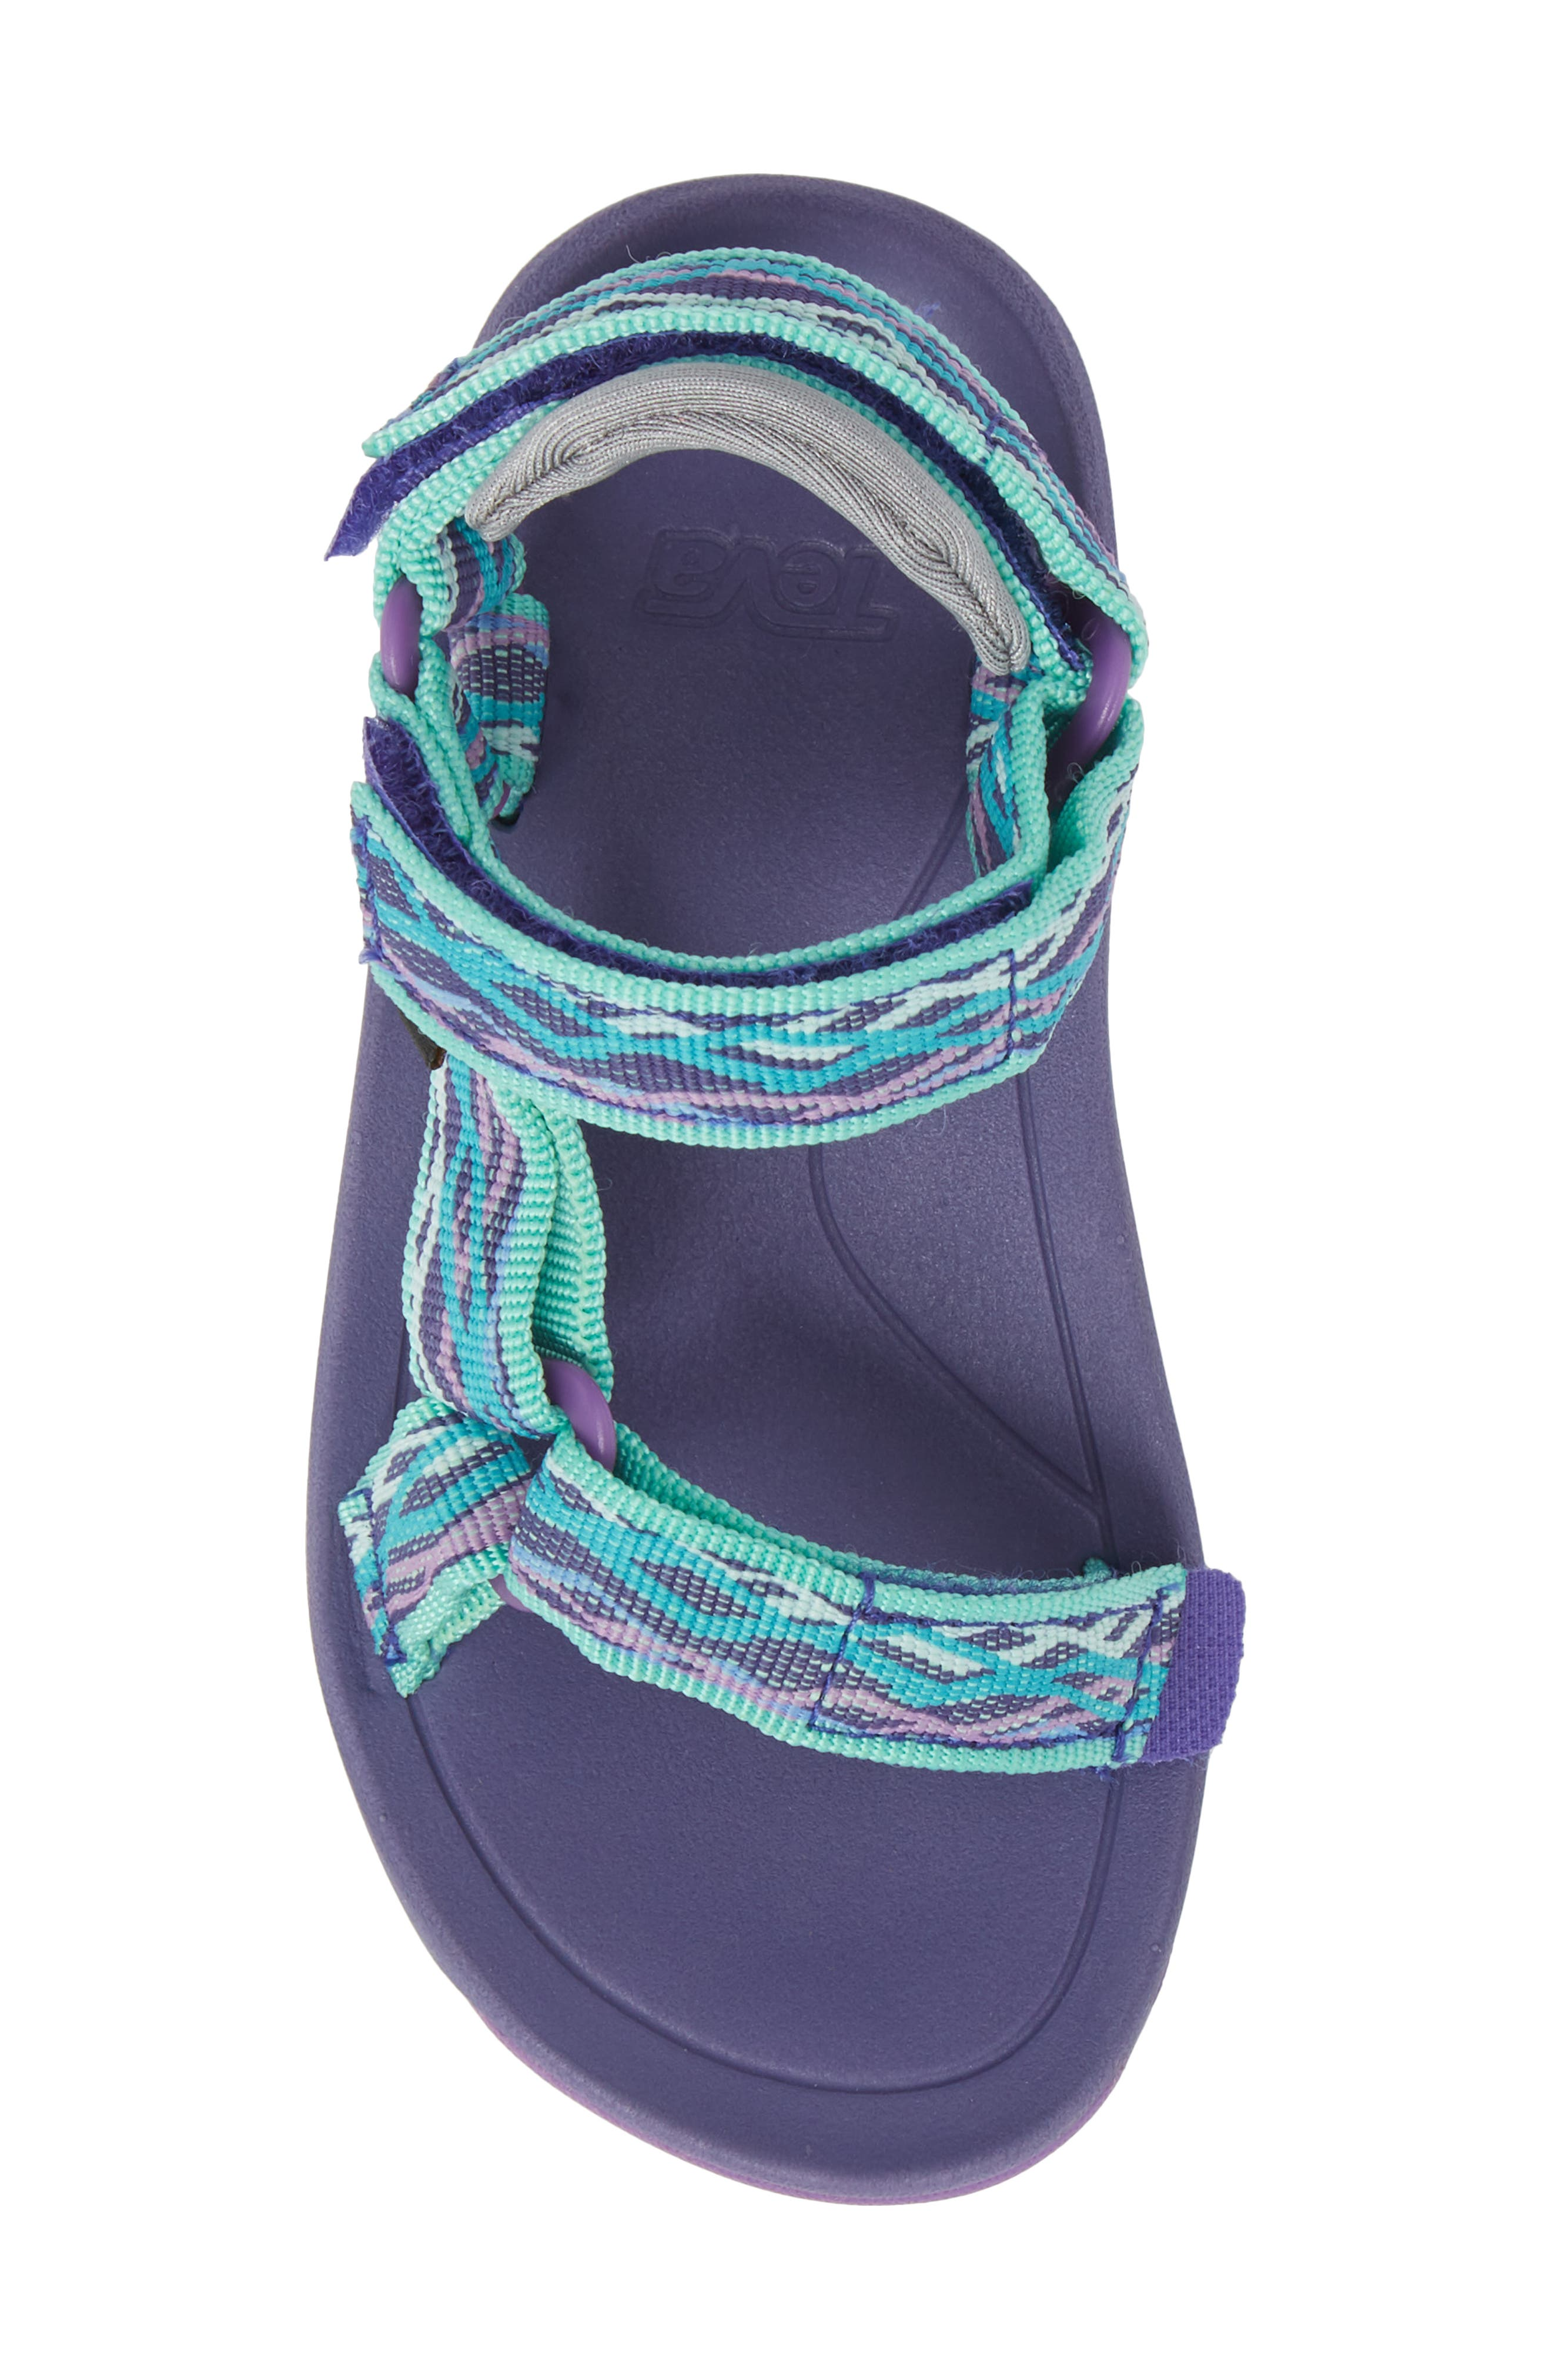 Hurricane XLT 2 Sandal,                             Alternate thumbnail 5, color,                             Delmar Sea Glass / Purple